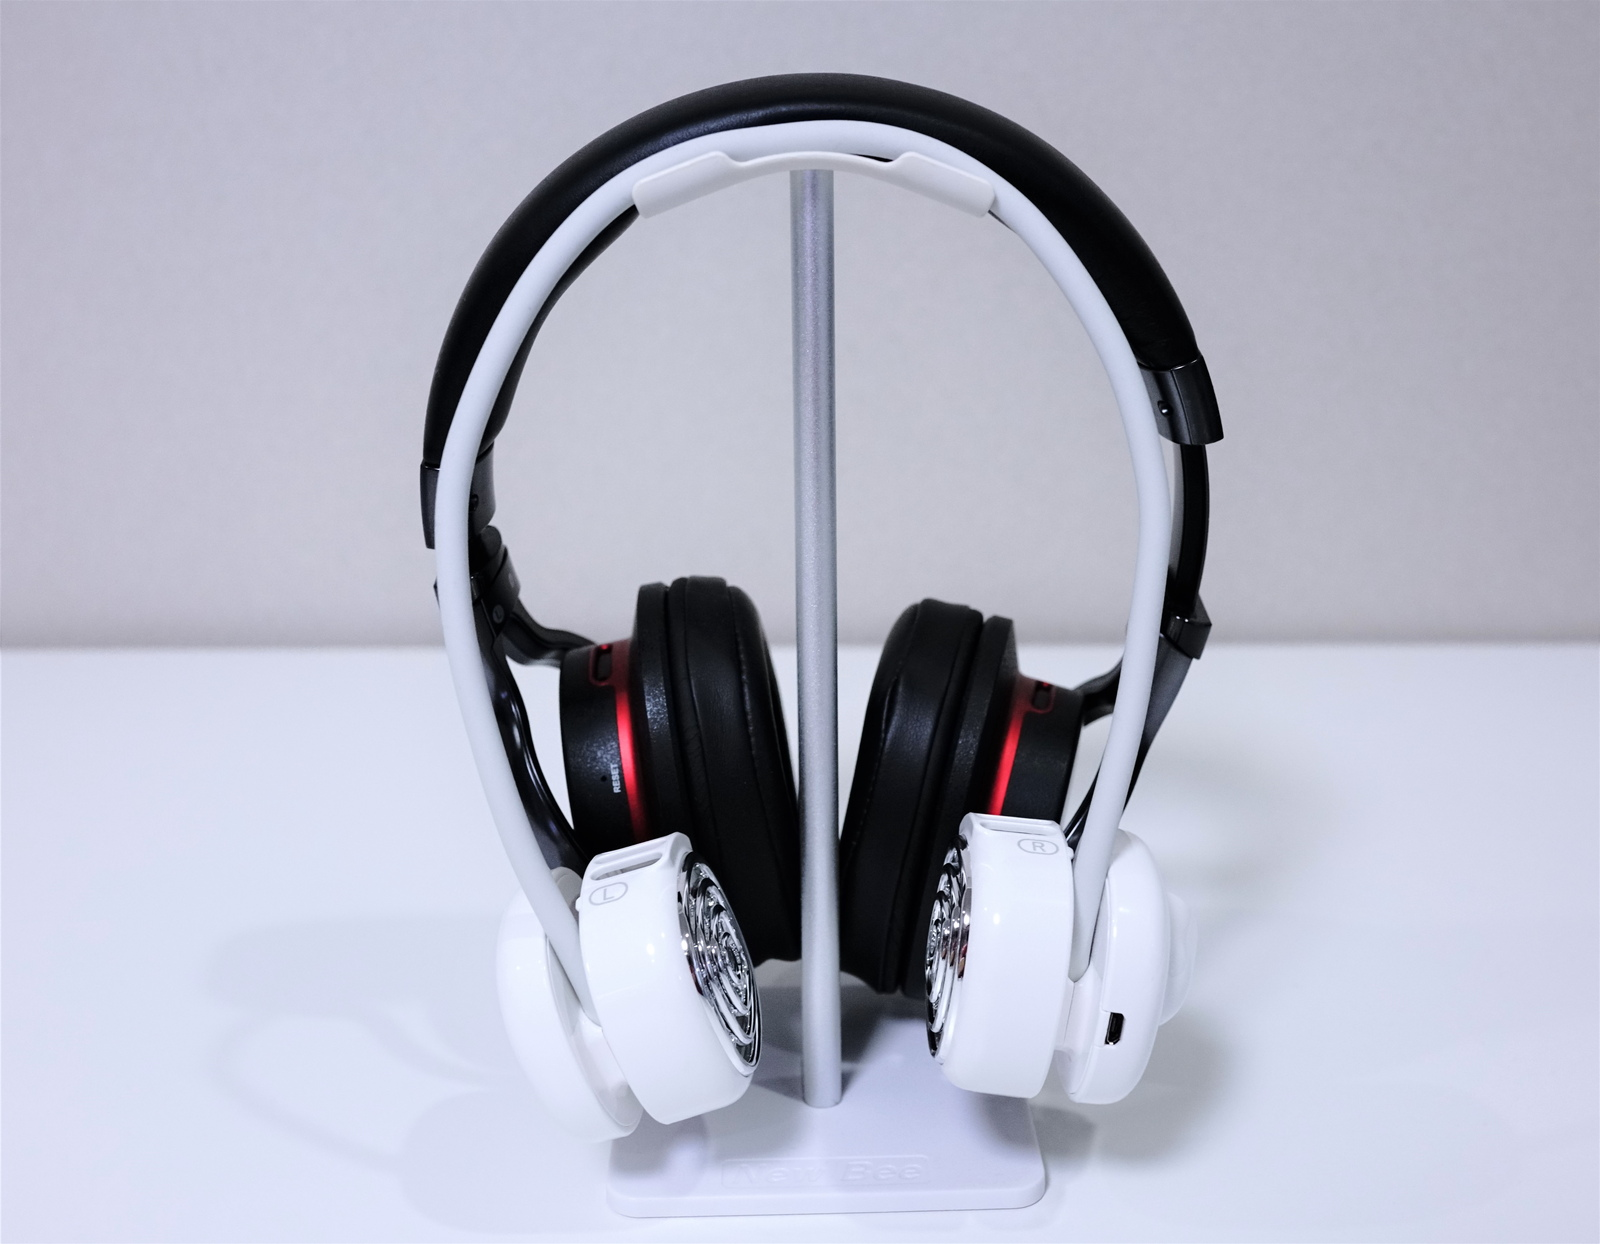 Dreamegg 首掛け扇風機 HD-E12 レビュー ヘッドフォンと比較してみた